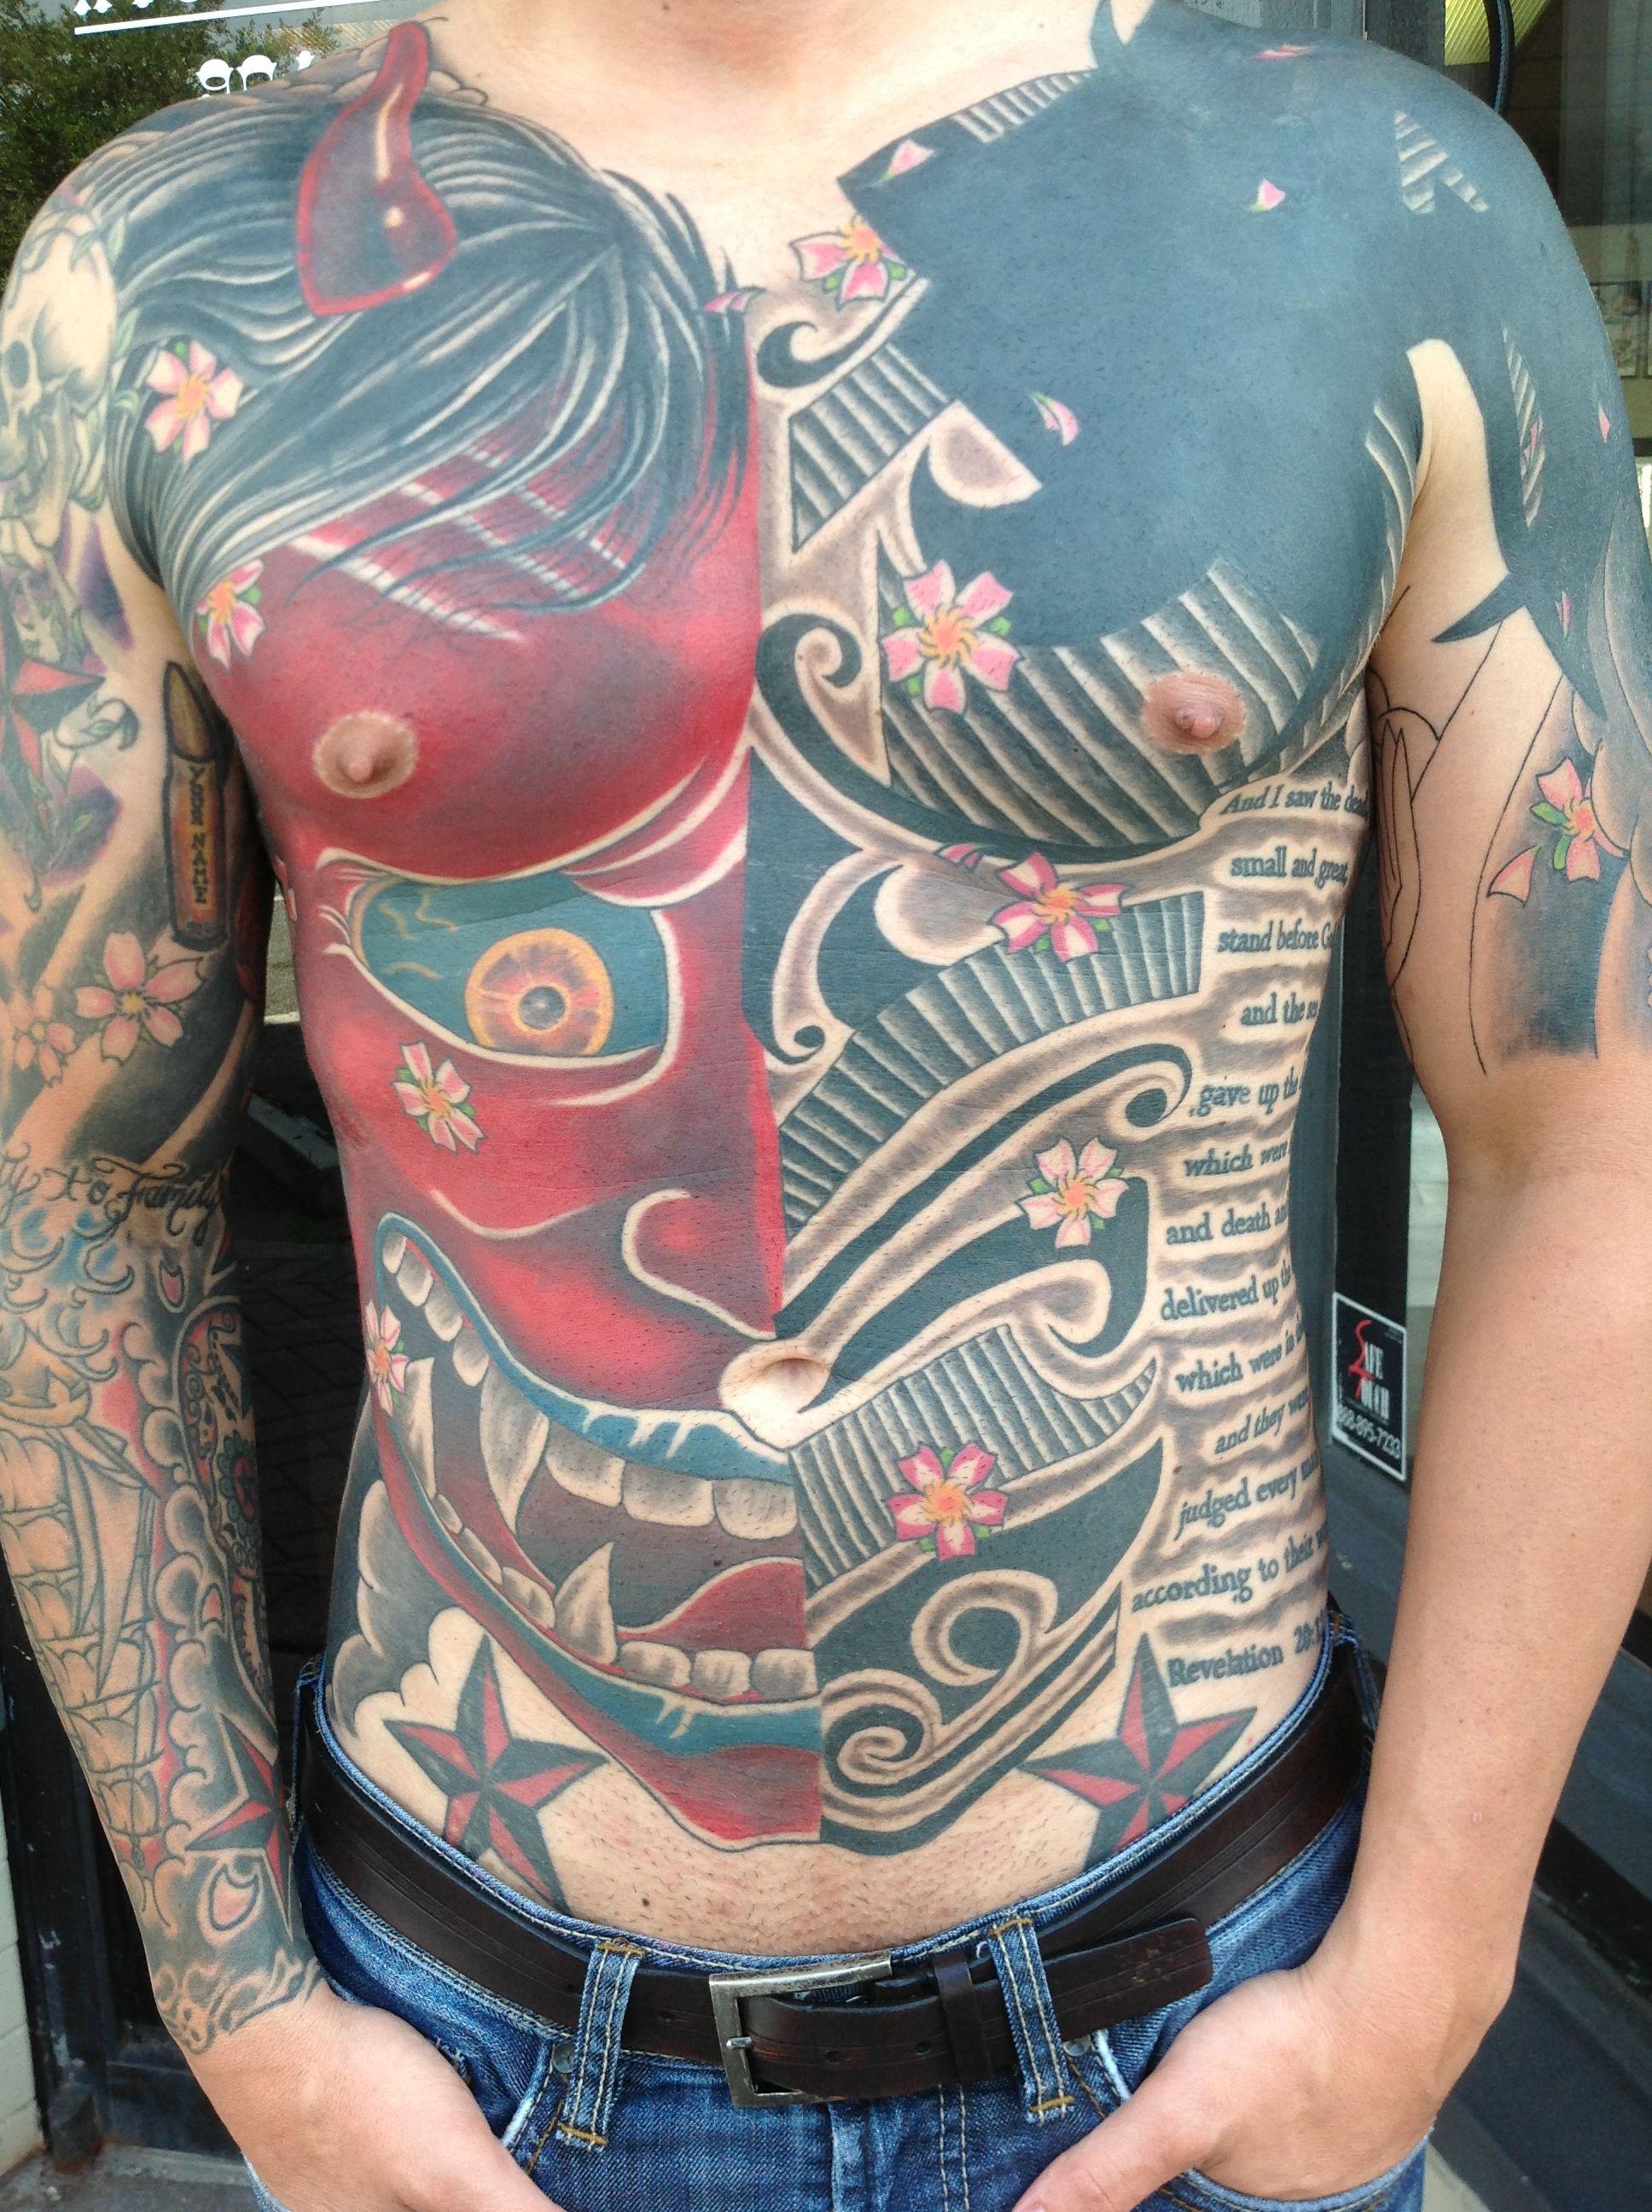 Full Chest Tattoo Coverup Chest Tattoo Men Chest Tattoo Cover Up Full Chest Tattoos